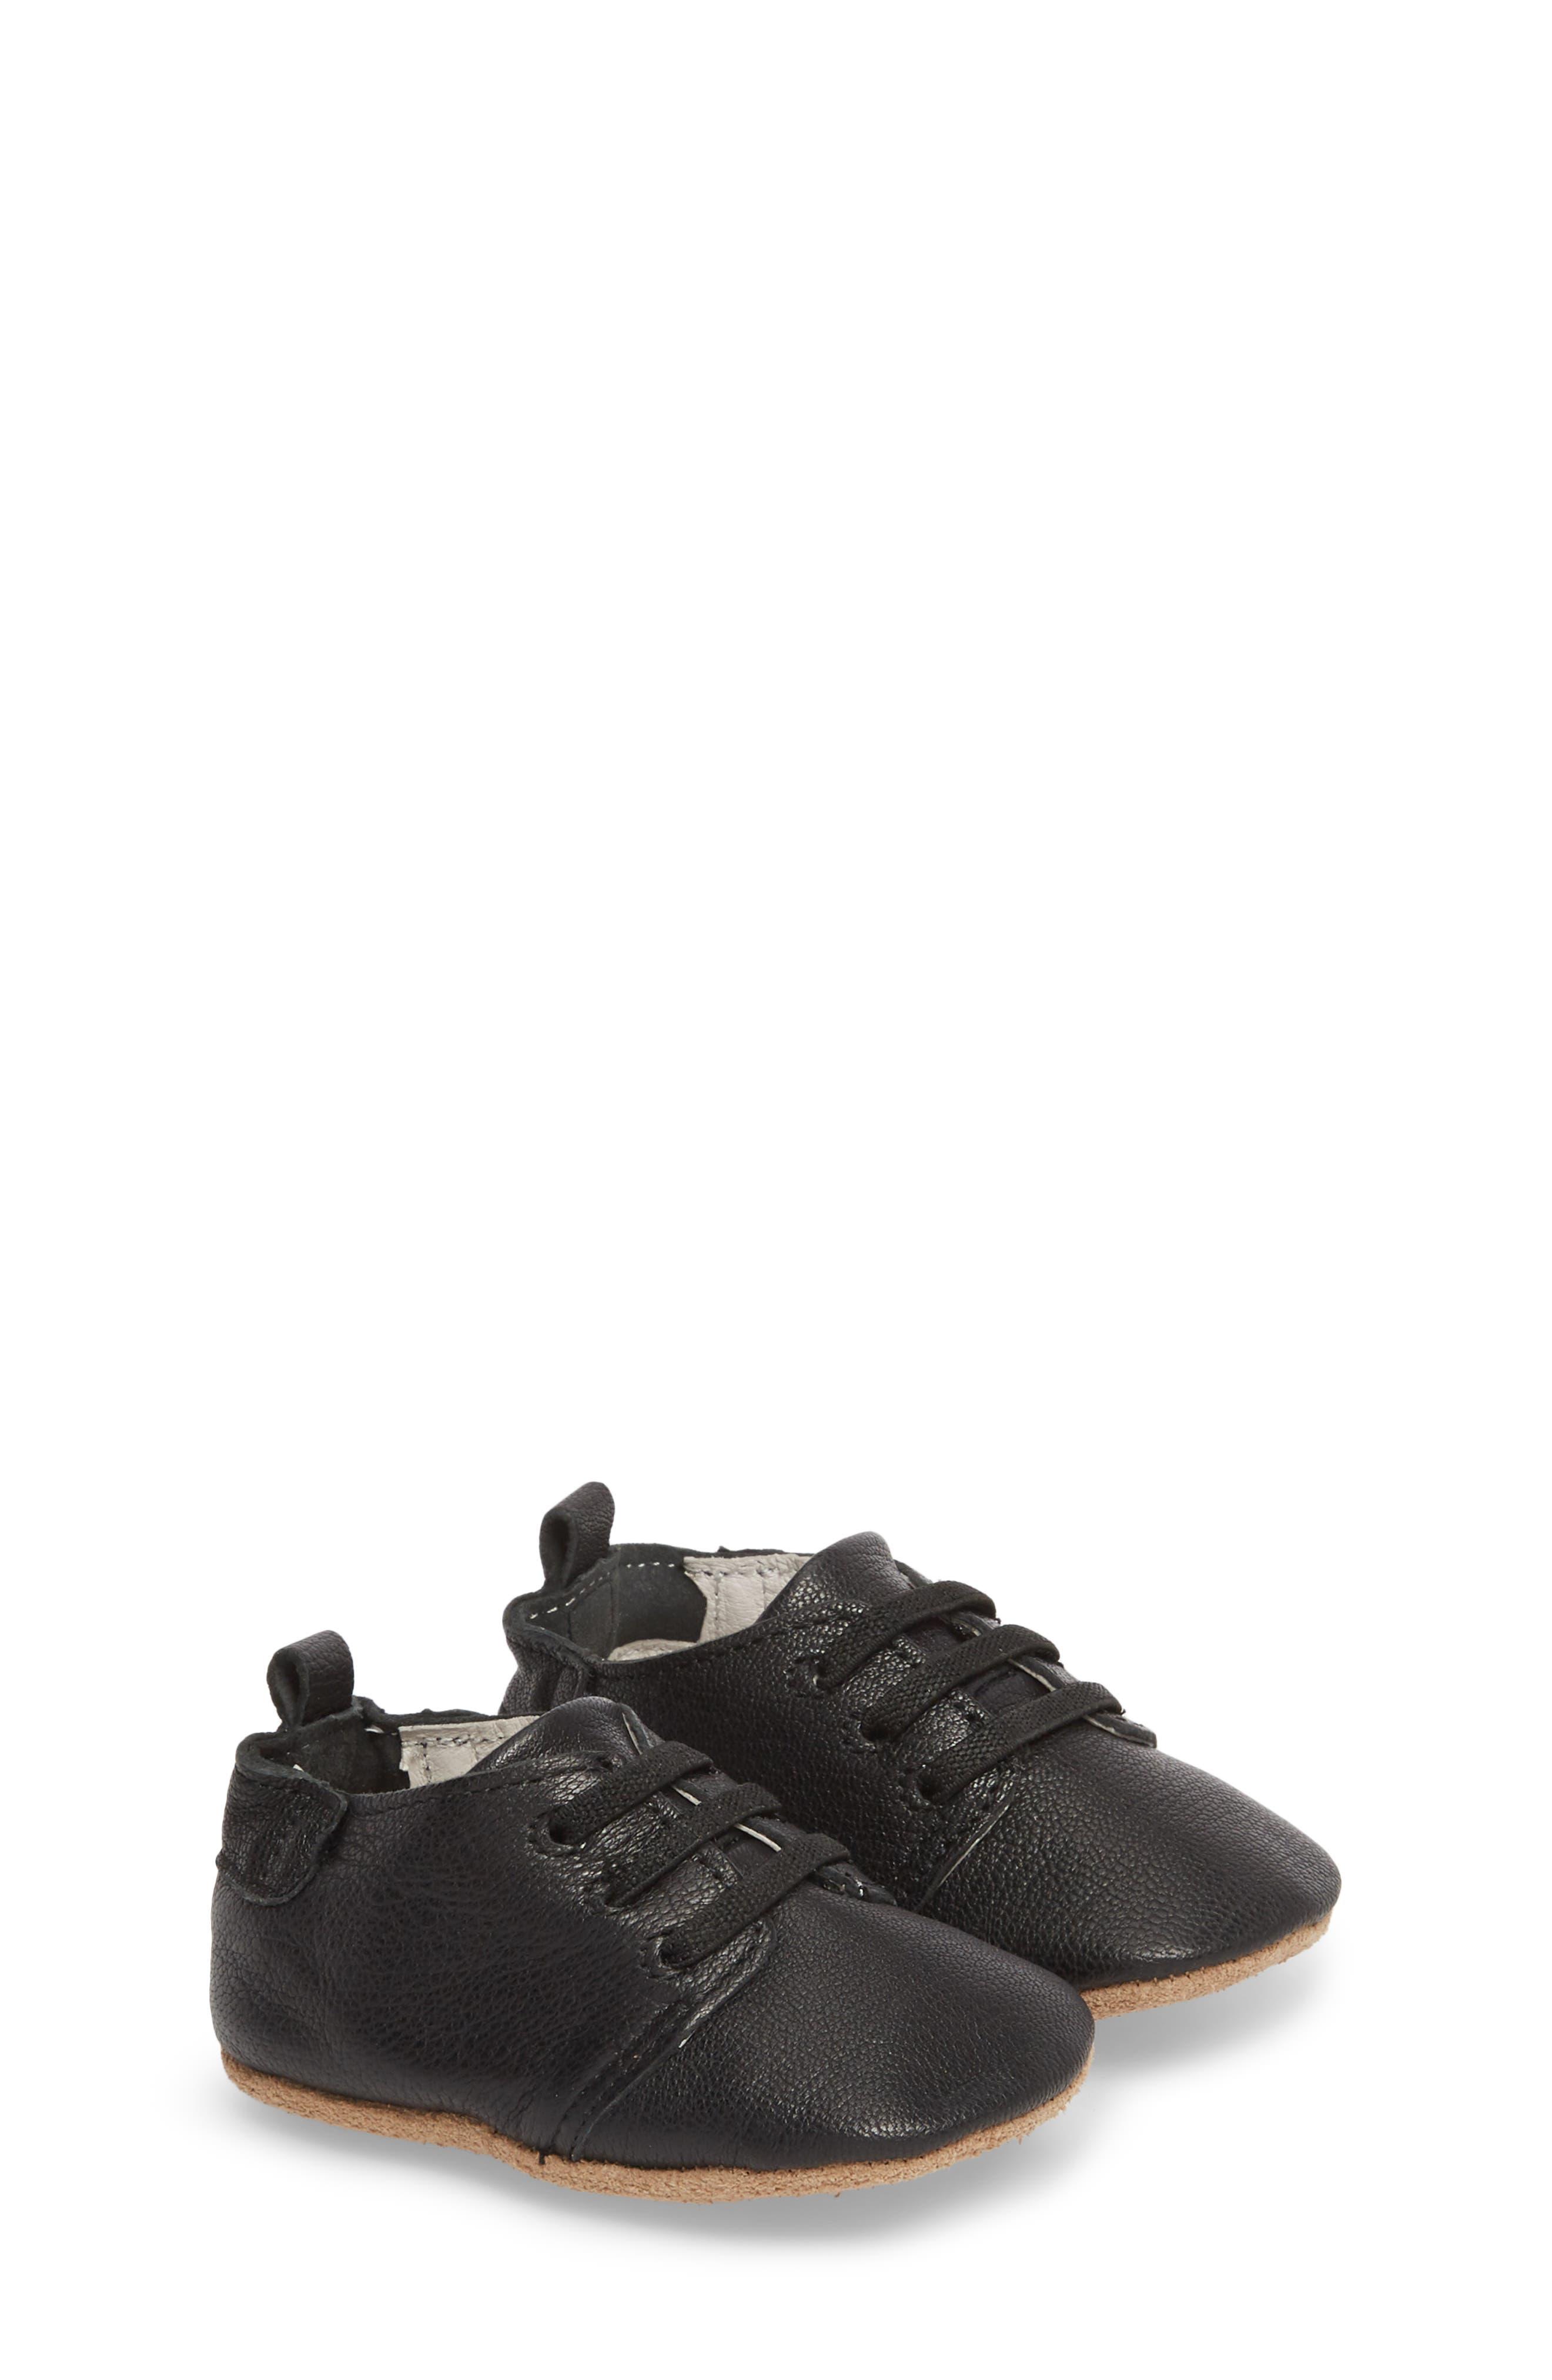 Infant Boys Robeez Owen Oxford Crib Shoe Size 912 months  Black